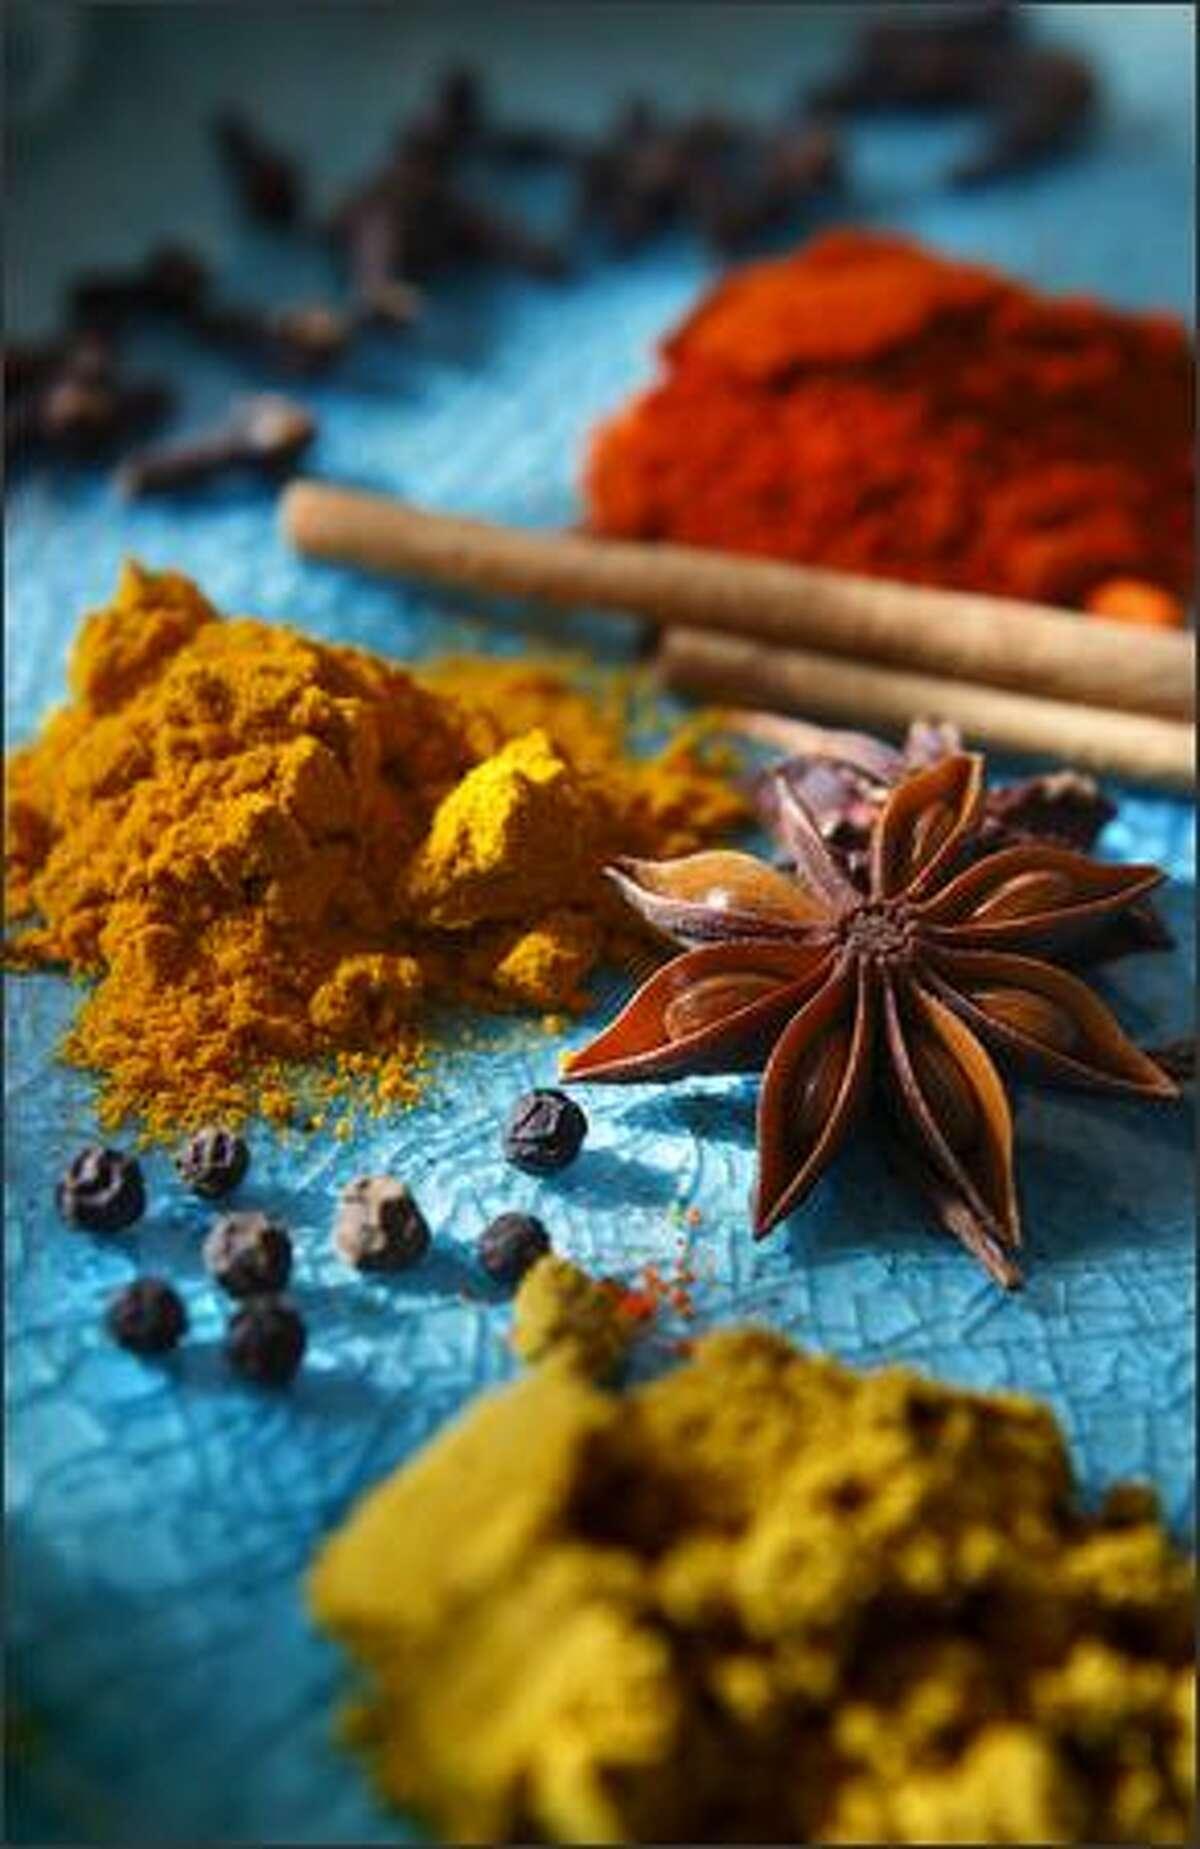 Clockwise from bottom: garam masala, black pepper corns, cumin powder, cloves, turmeric, cinnamon and star anise.